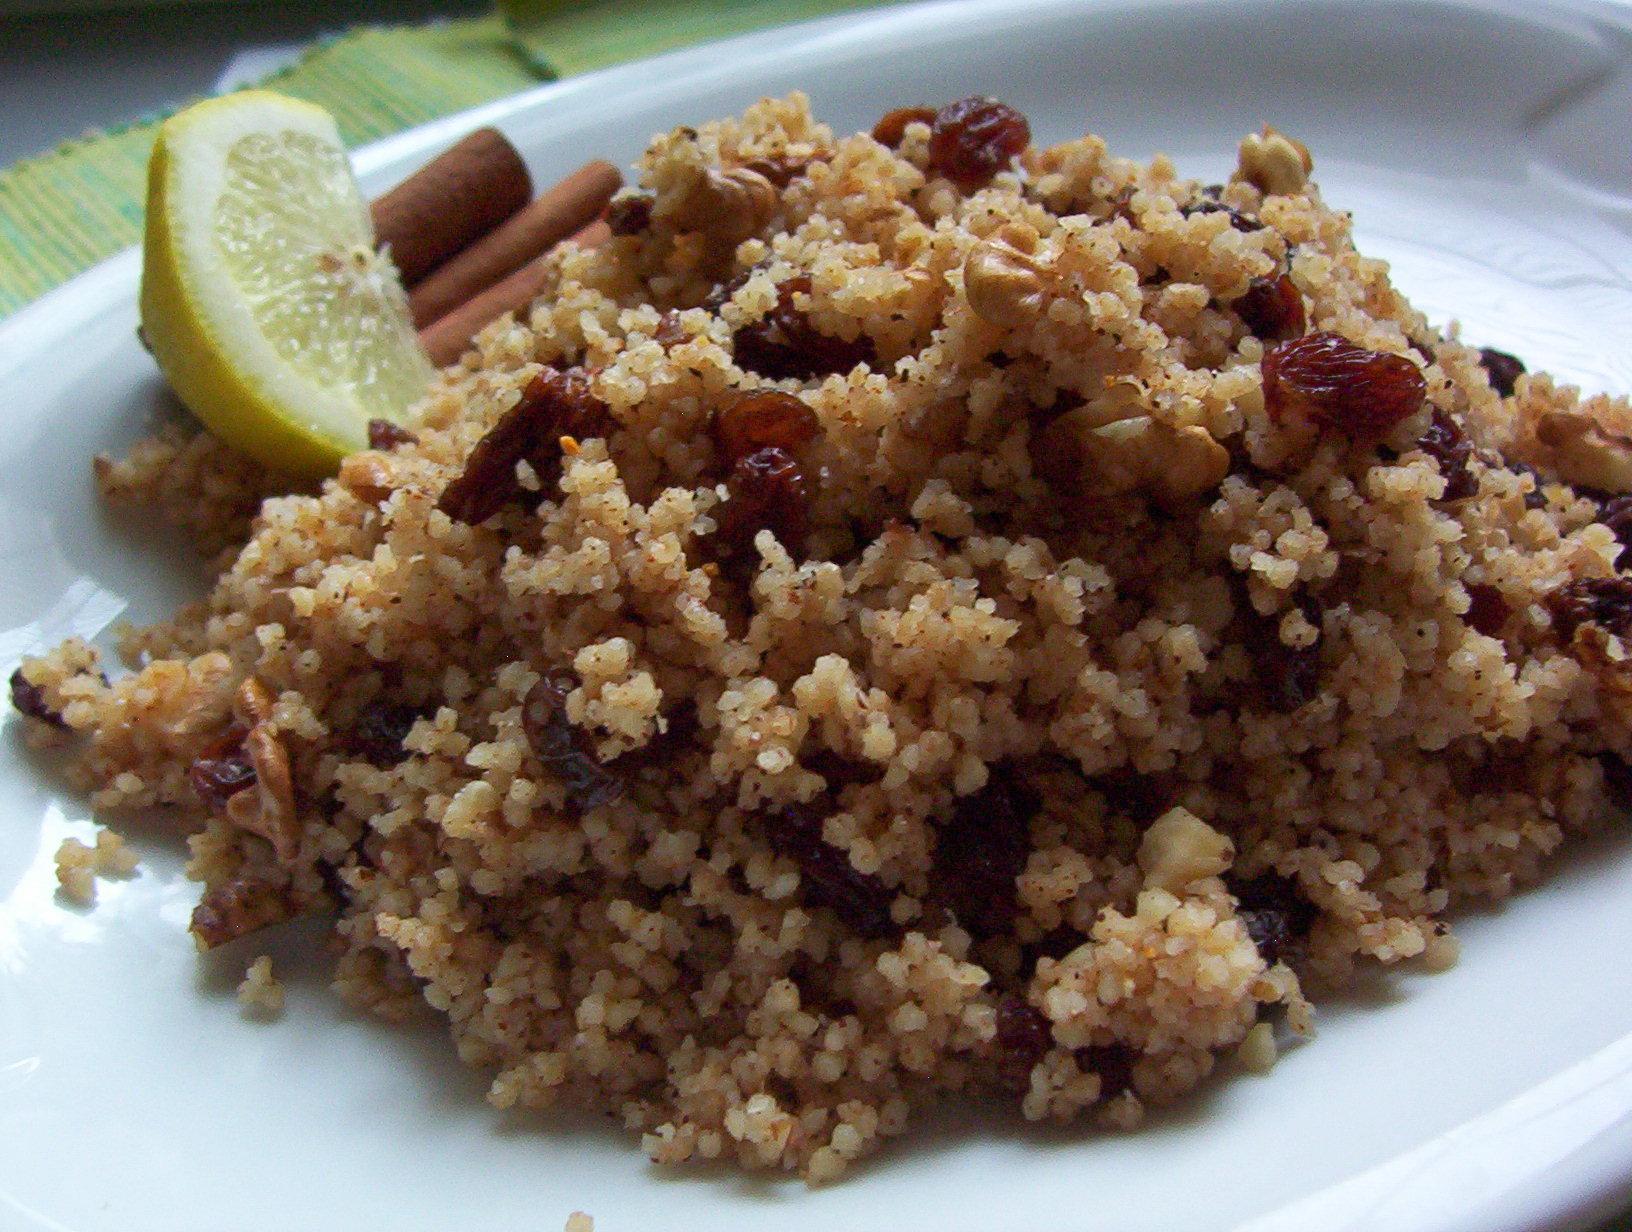 Fotografie receptu: Ořechový kuskus s rozinkami